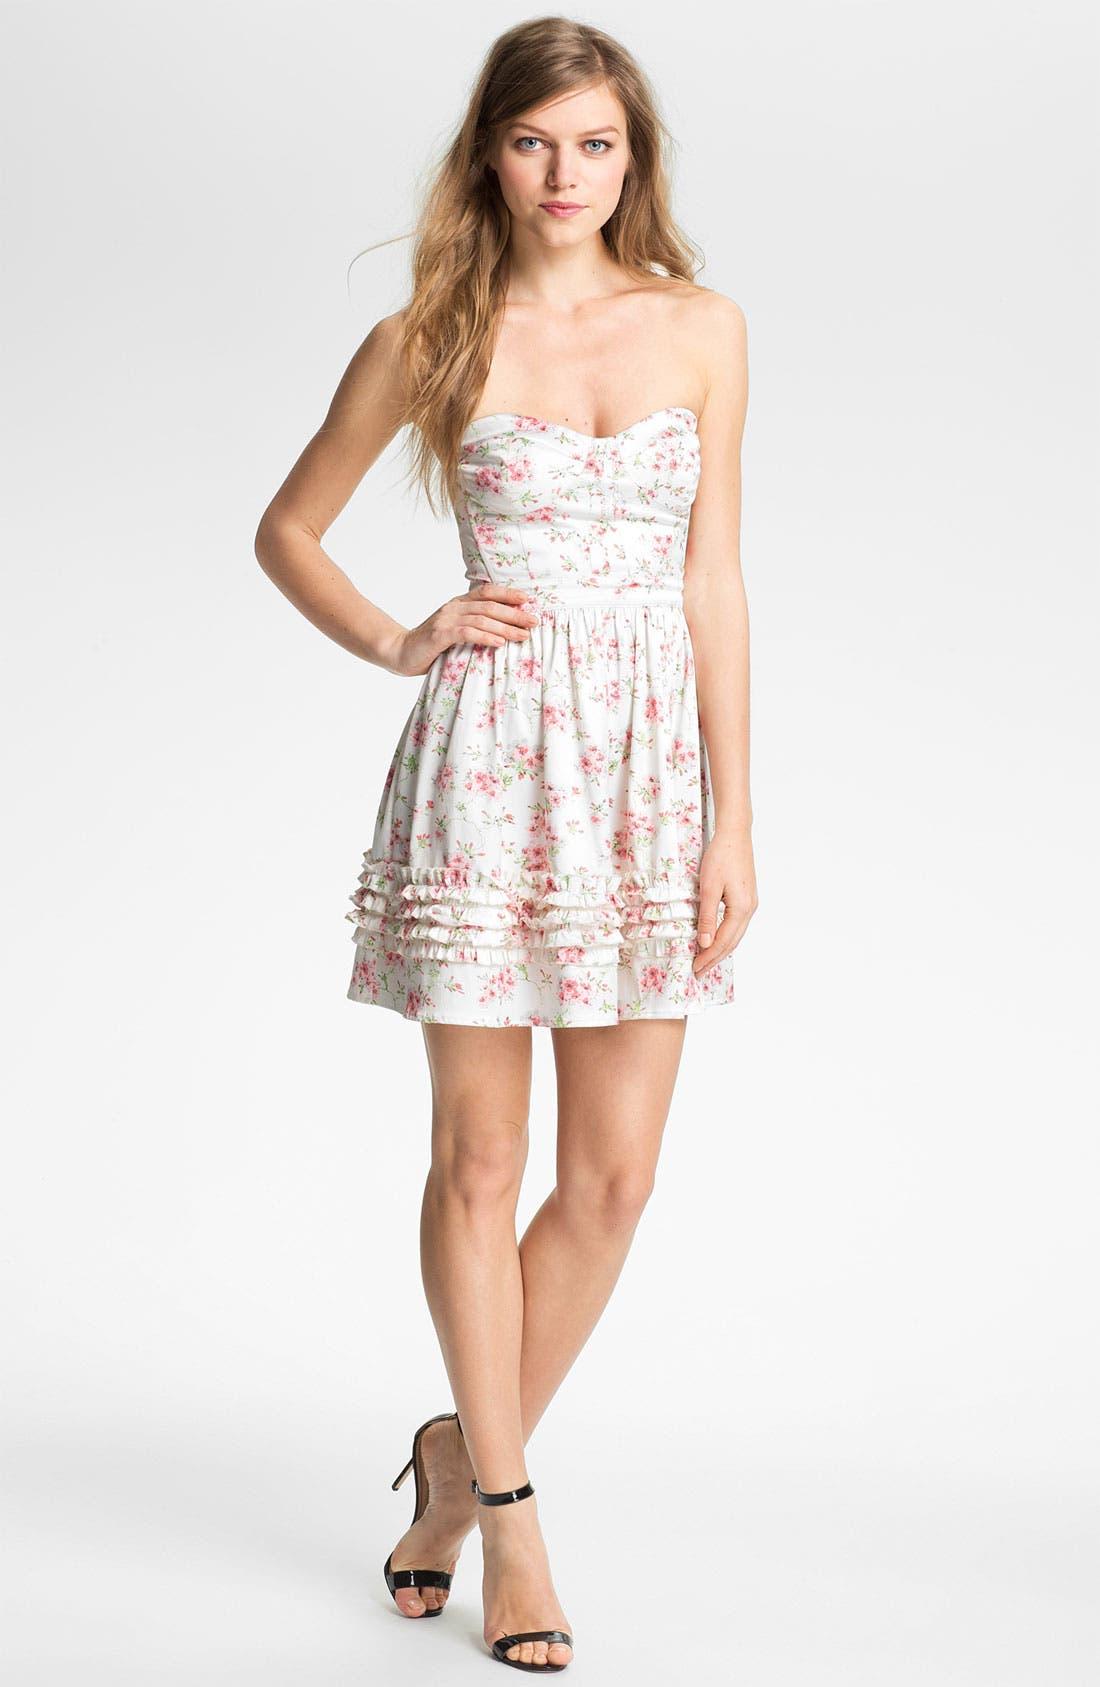 Alternate Image 1 Selected - Man Repeller X PJK 'Aurora' Print Cotton Blend Fit & Flare Dress